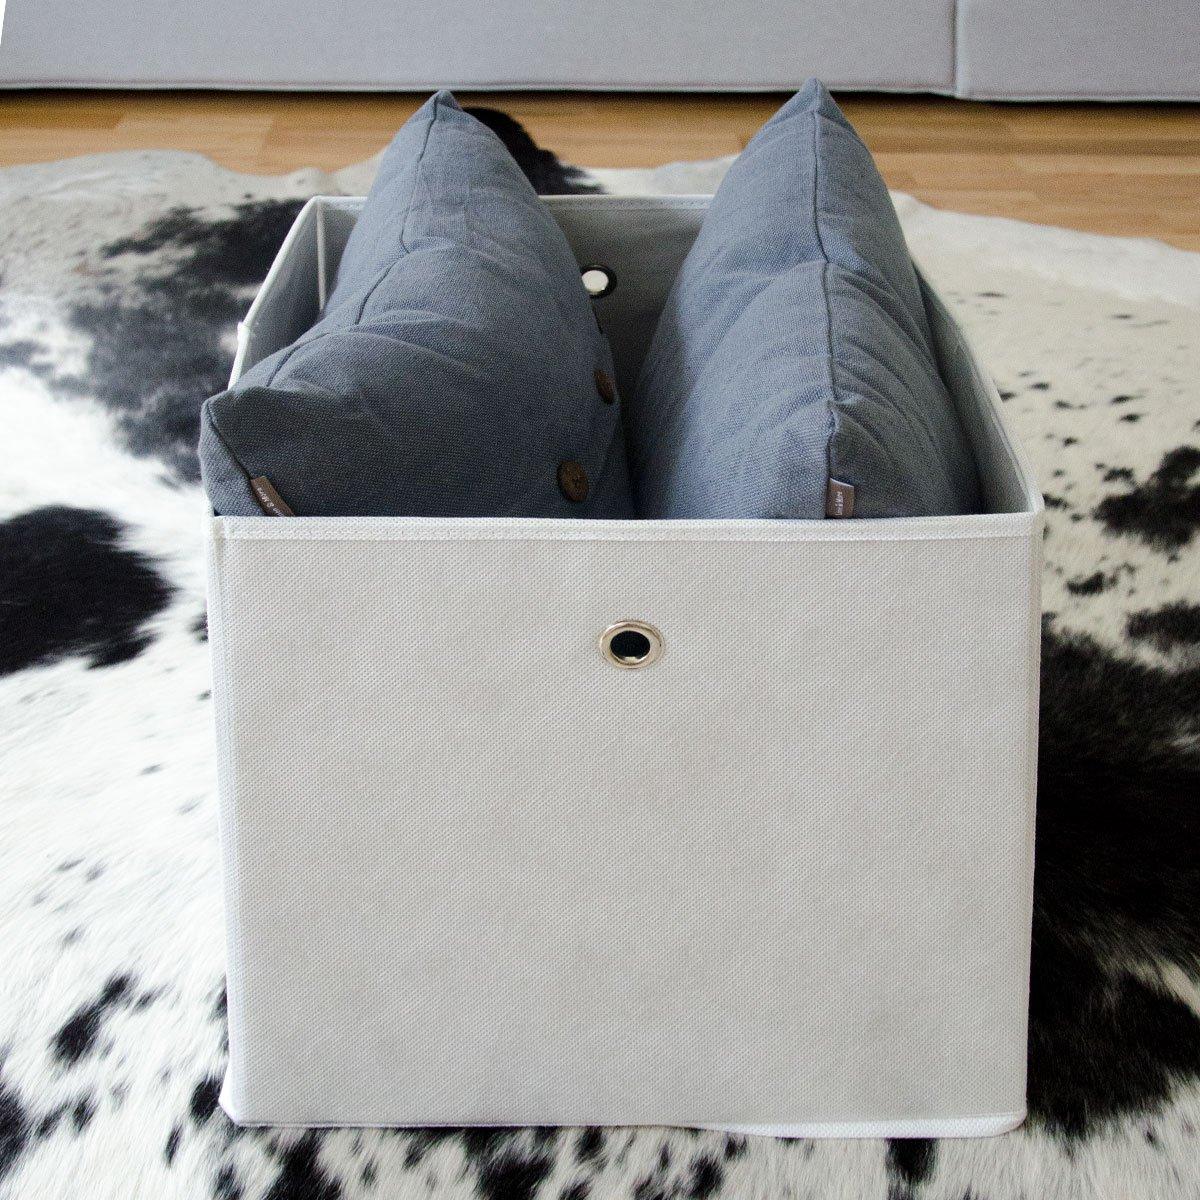 dunedesign faltbox set 4 boxen f r kallax regal wei. Black Bedroom Furniture Sets. Home Design Ideas